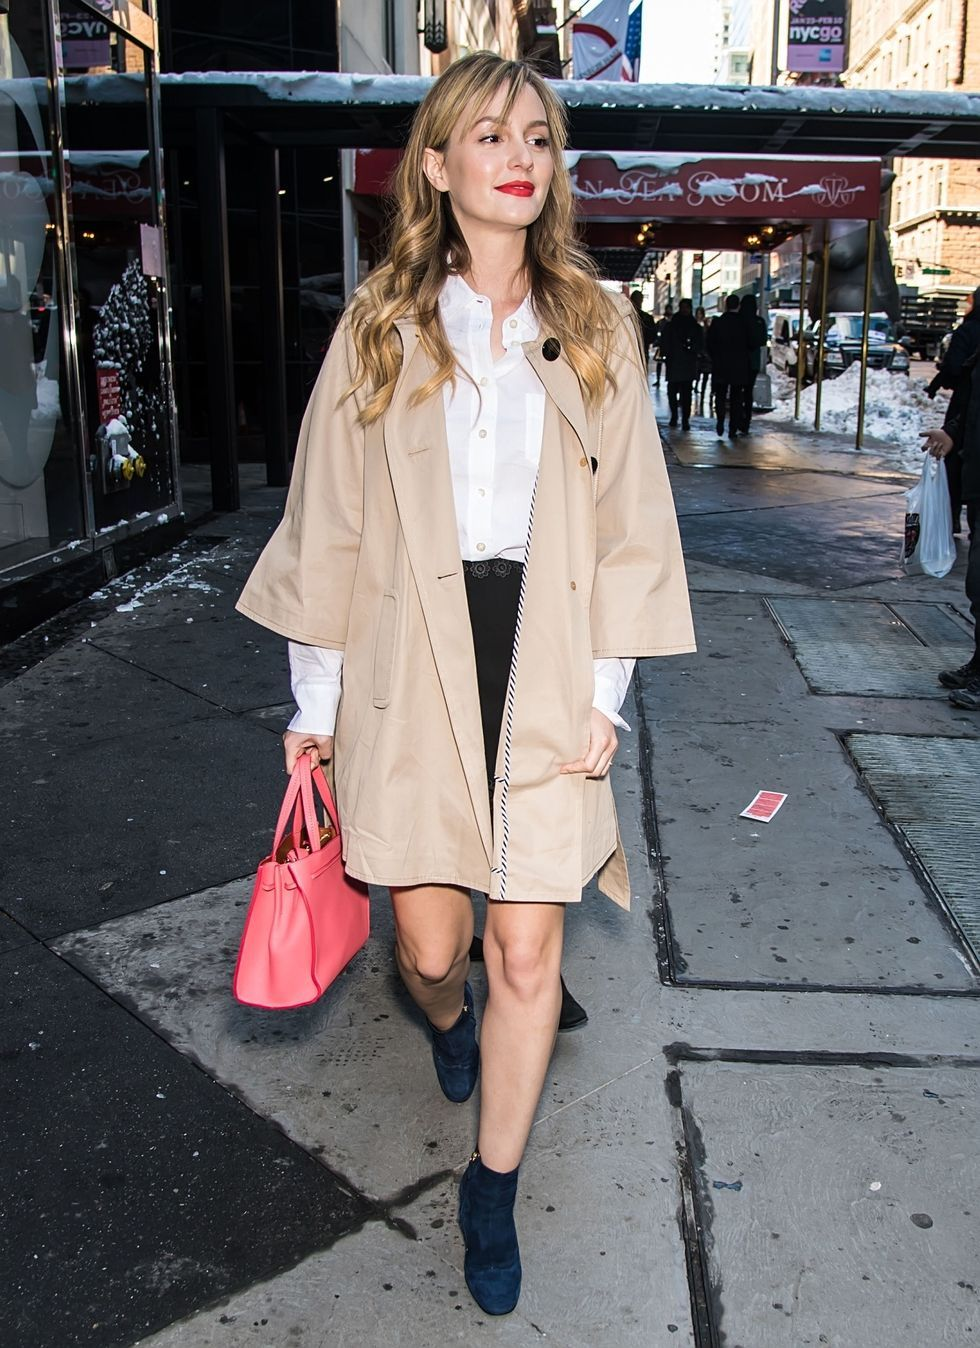 Leighton Meester On Corsets, Gwyneth, And Blair Waldorf 2.0